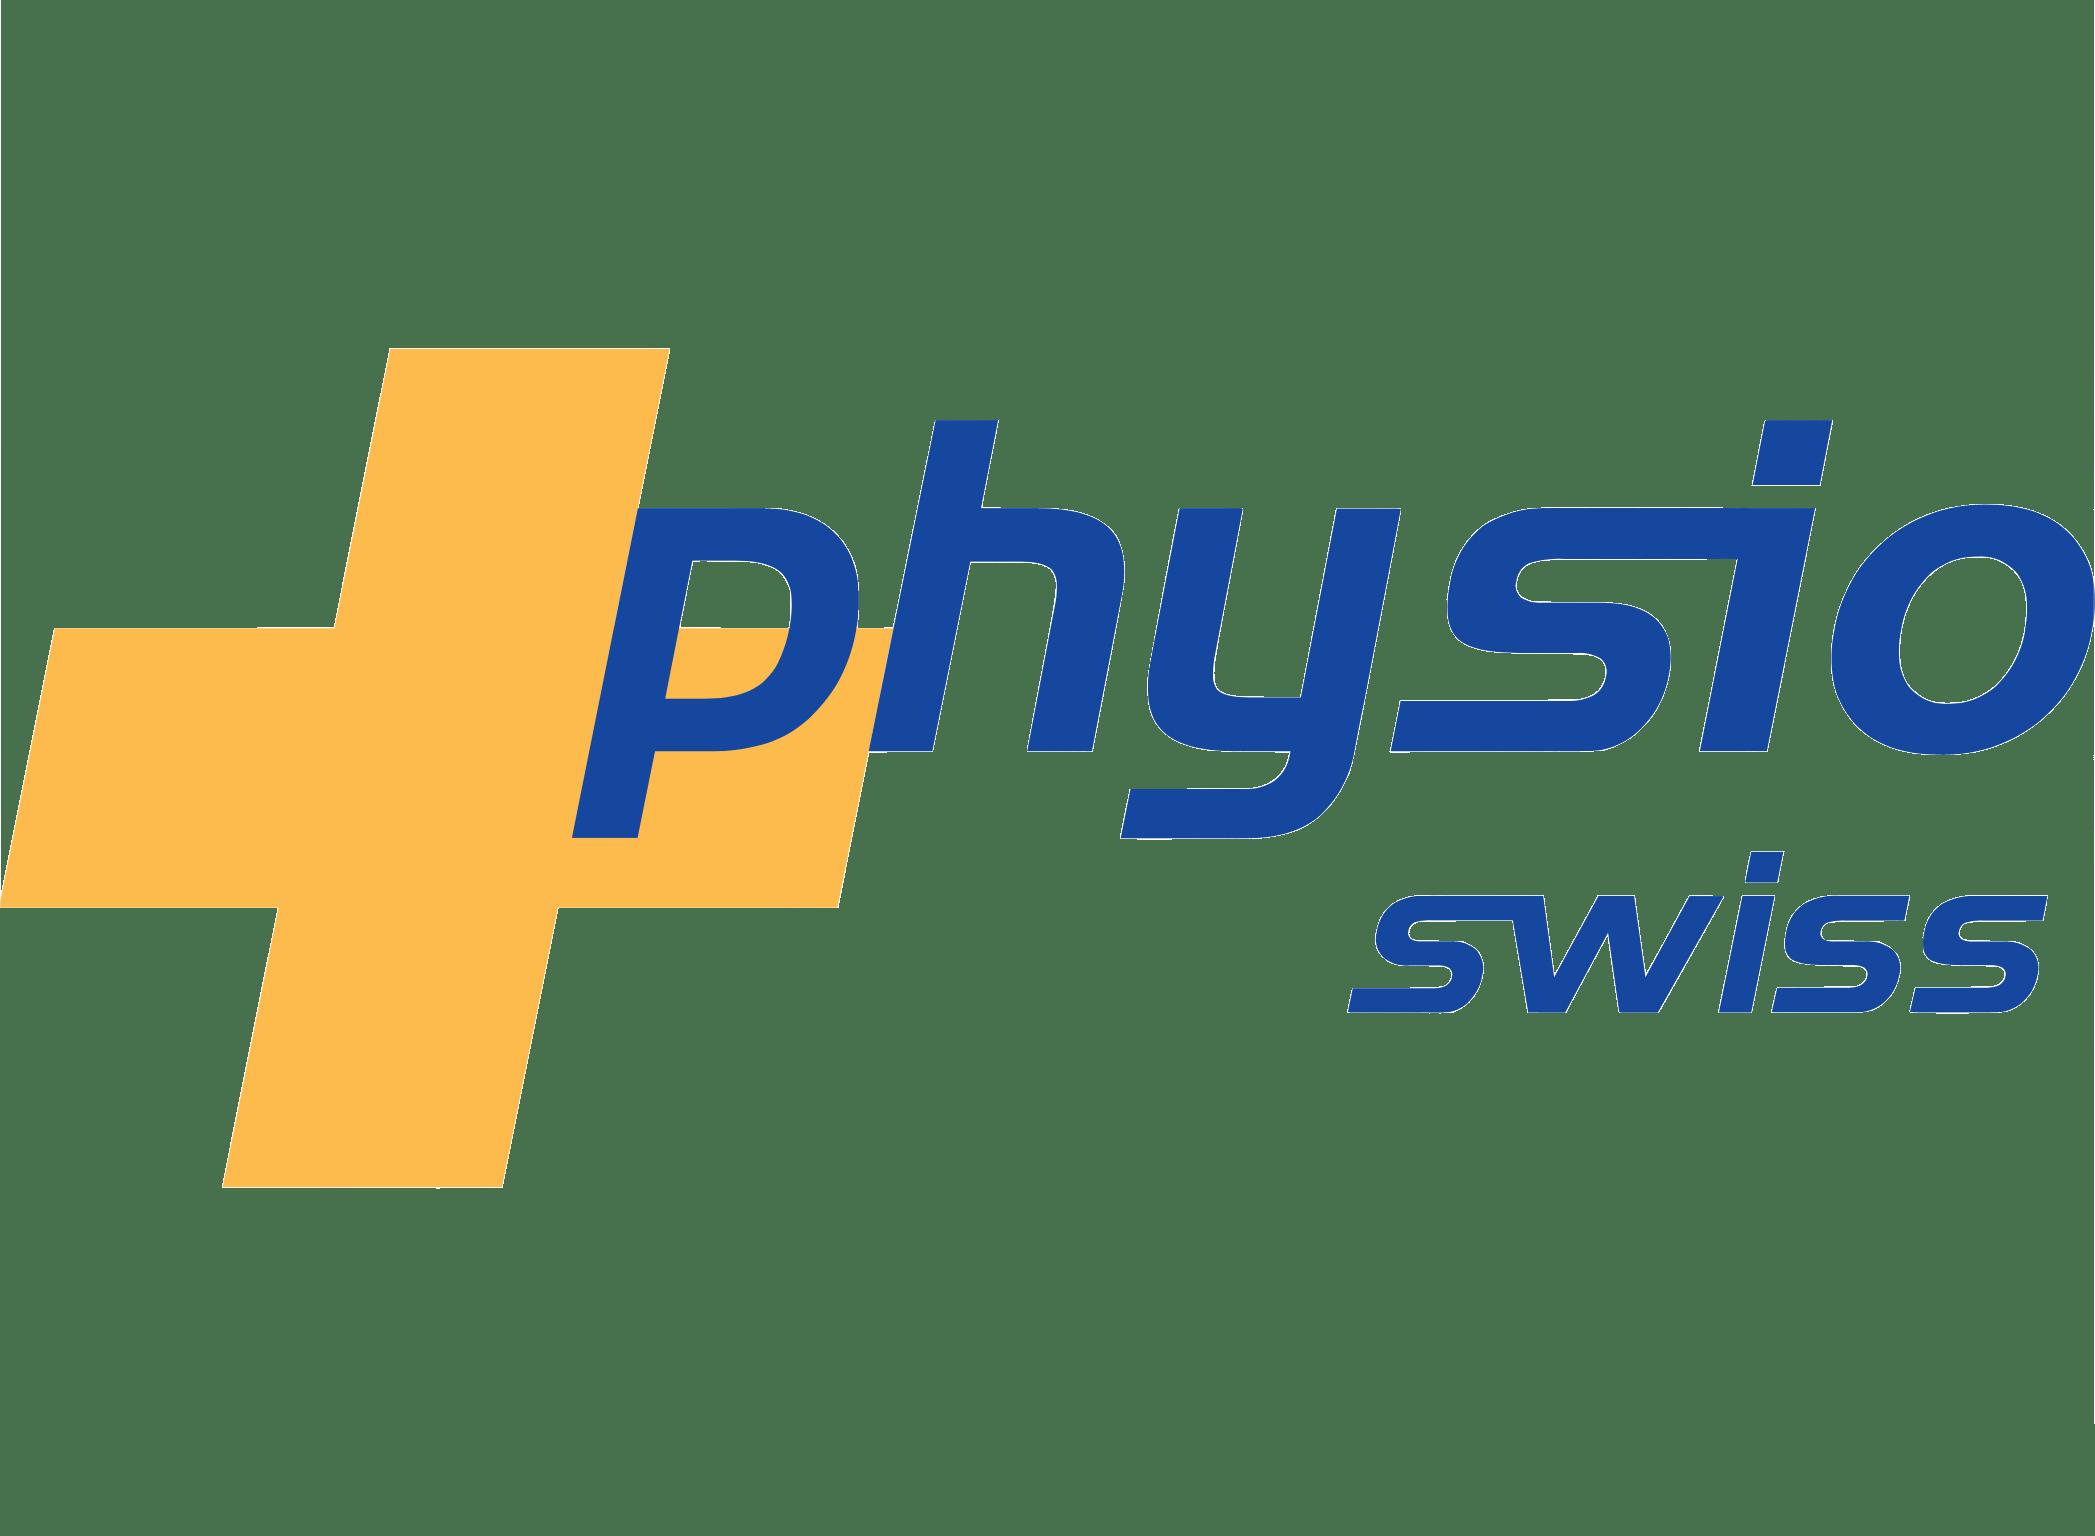 Membre Physio Suisse